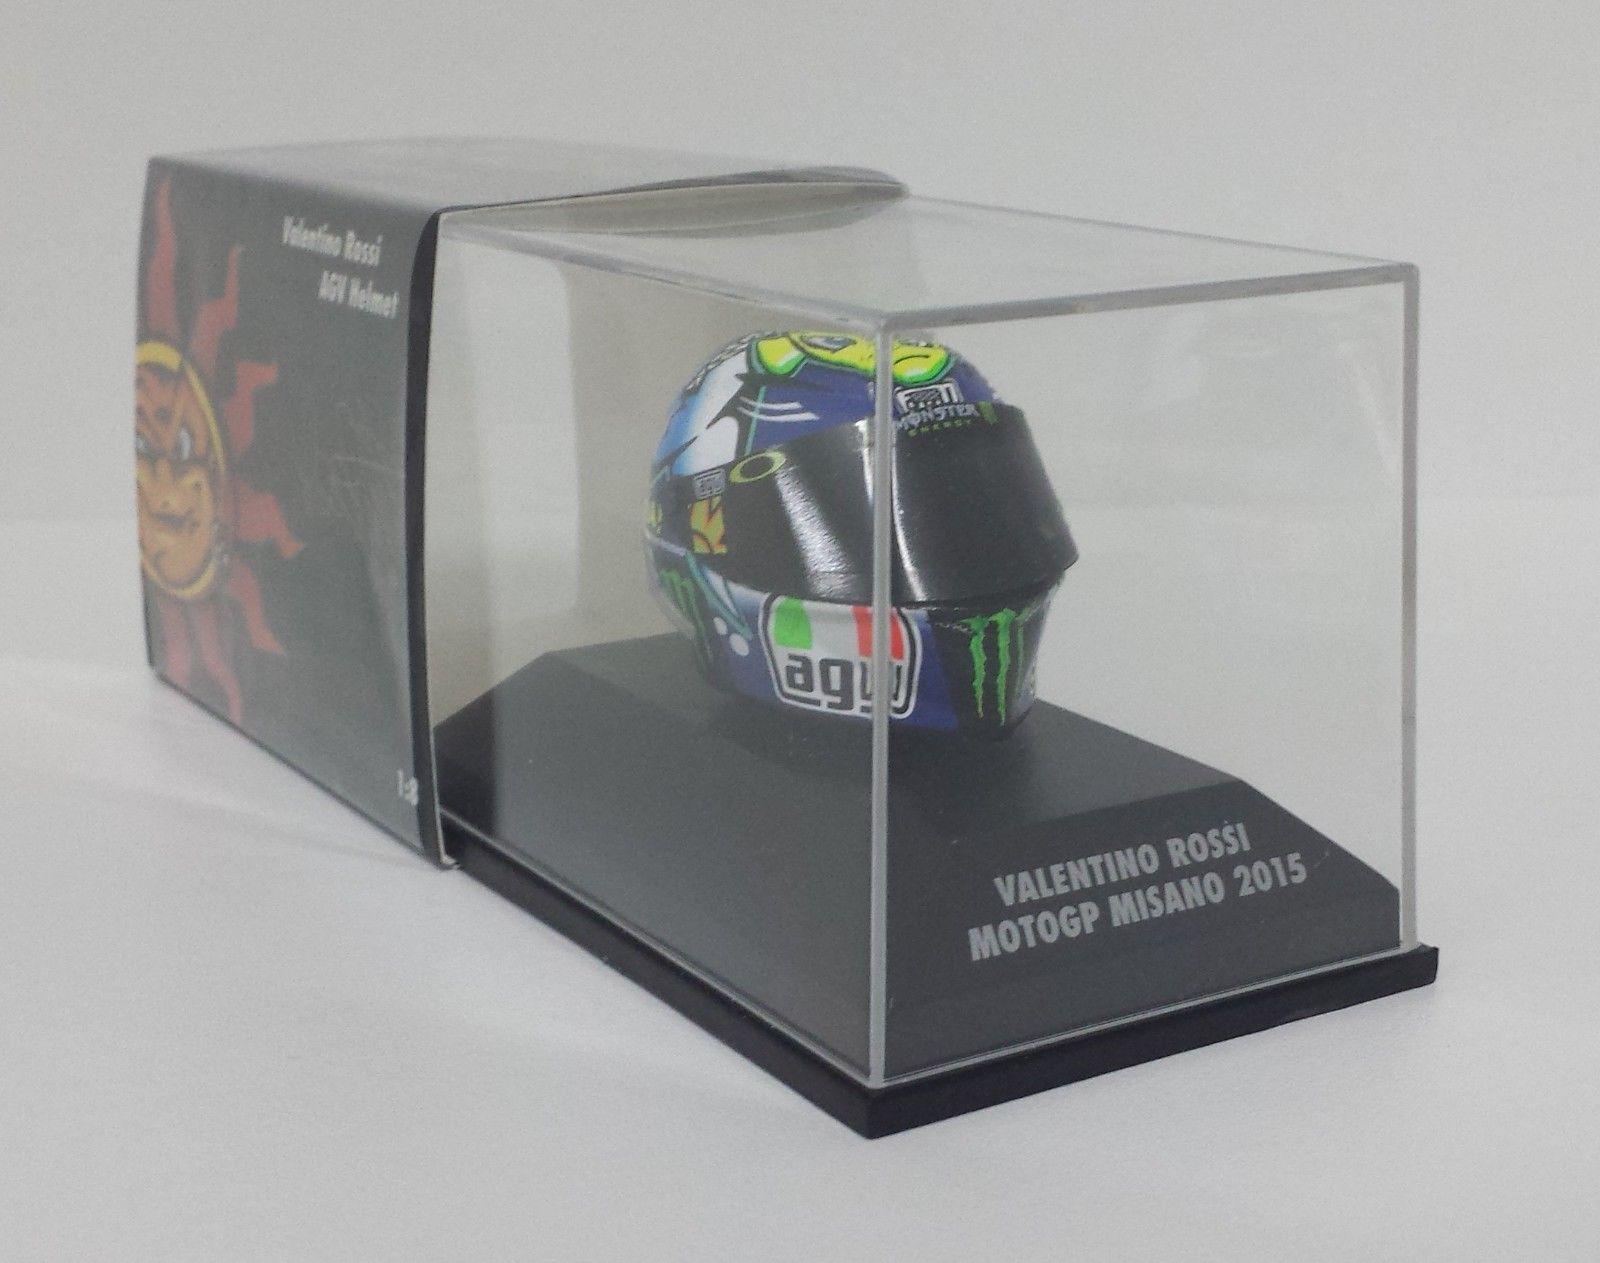 MINICHAMPS VALENTINO ROSSI MODELLINO AGV CASCO HELMET 1/8 MOTOGP MISANO 2015 NEW